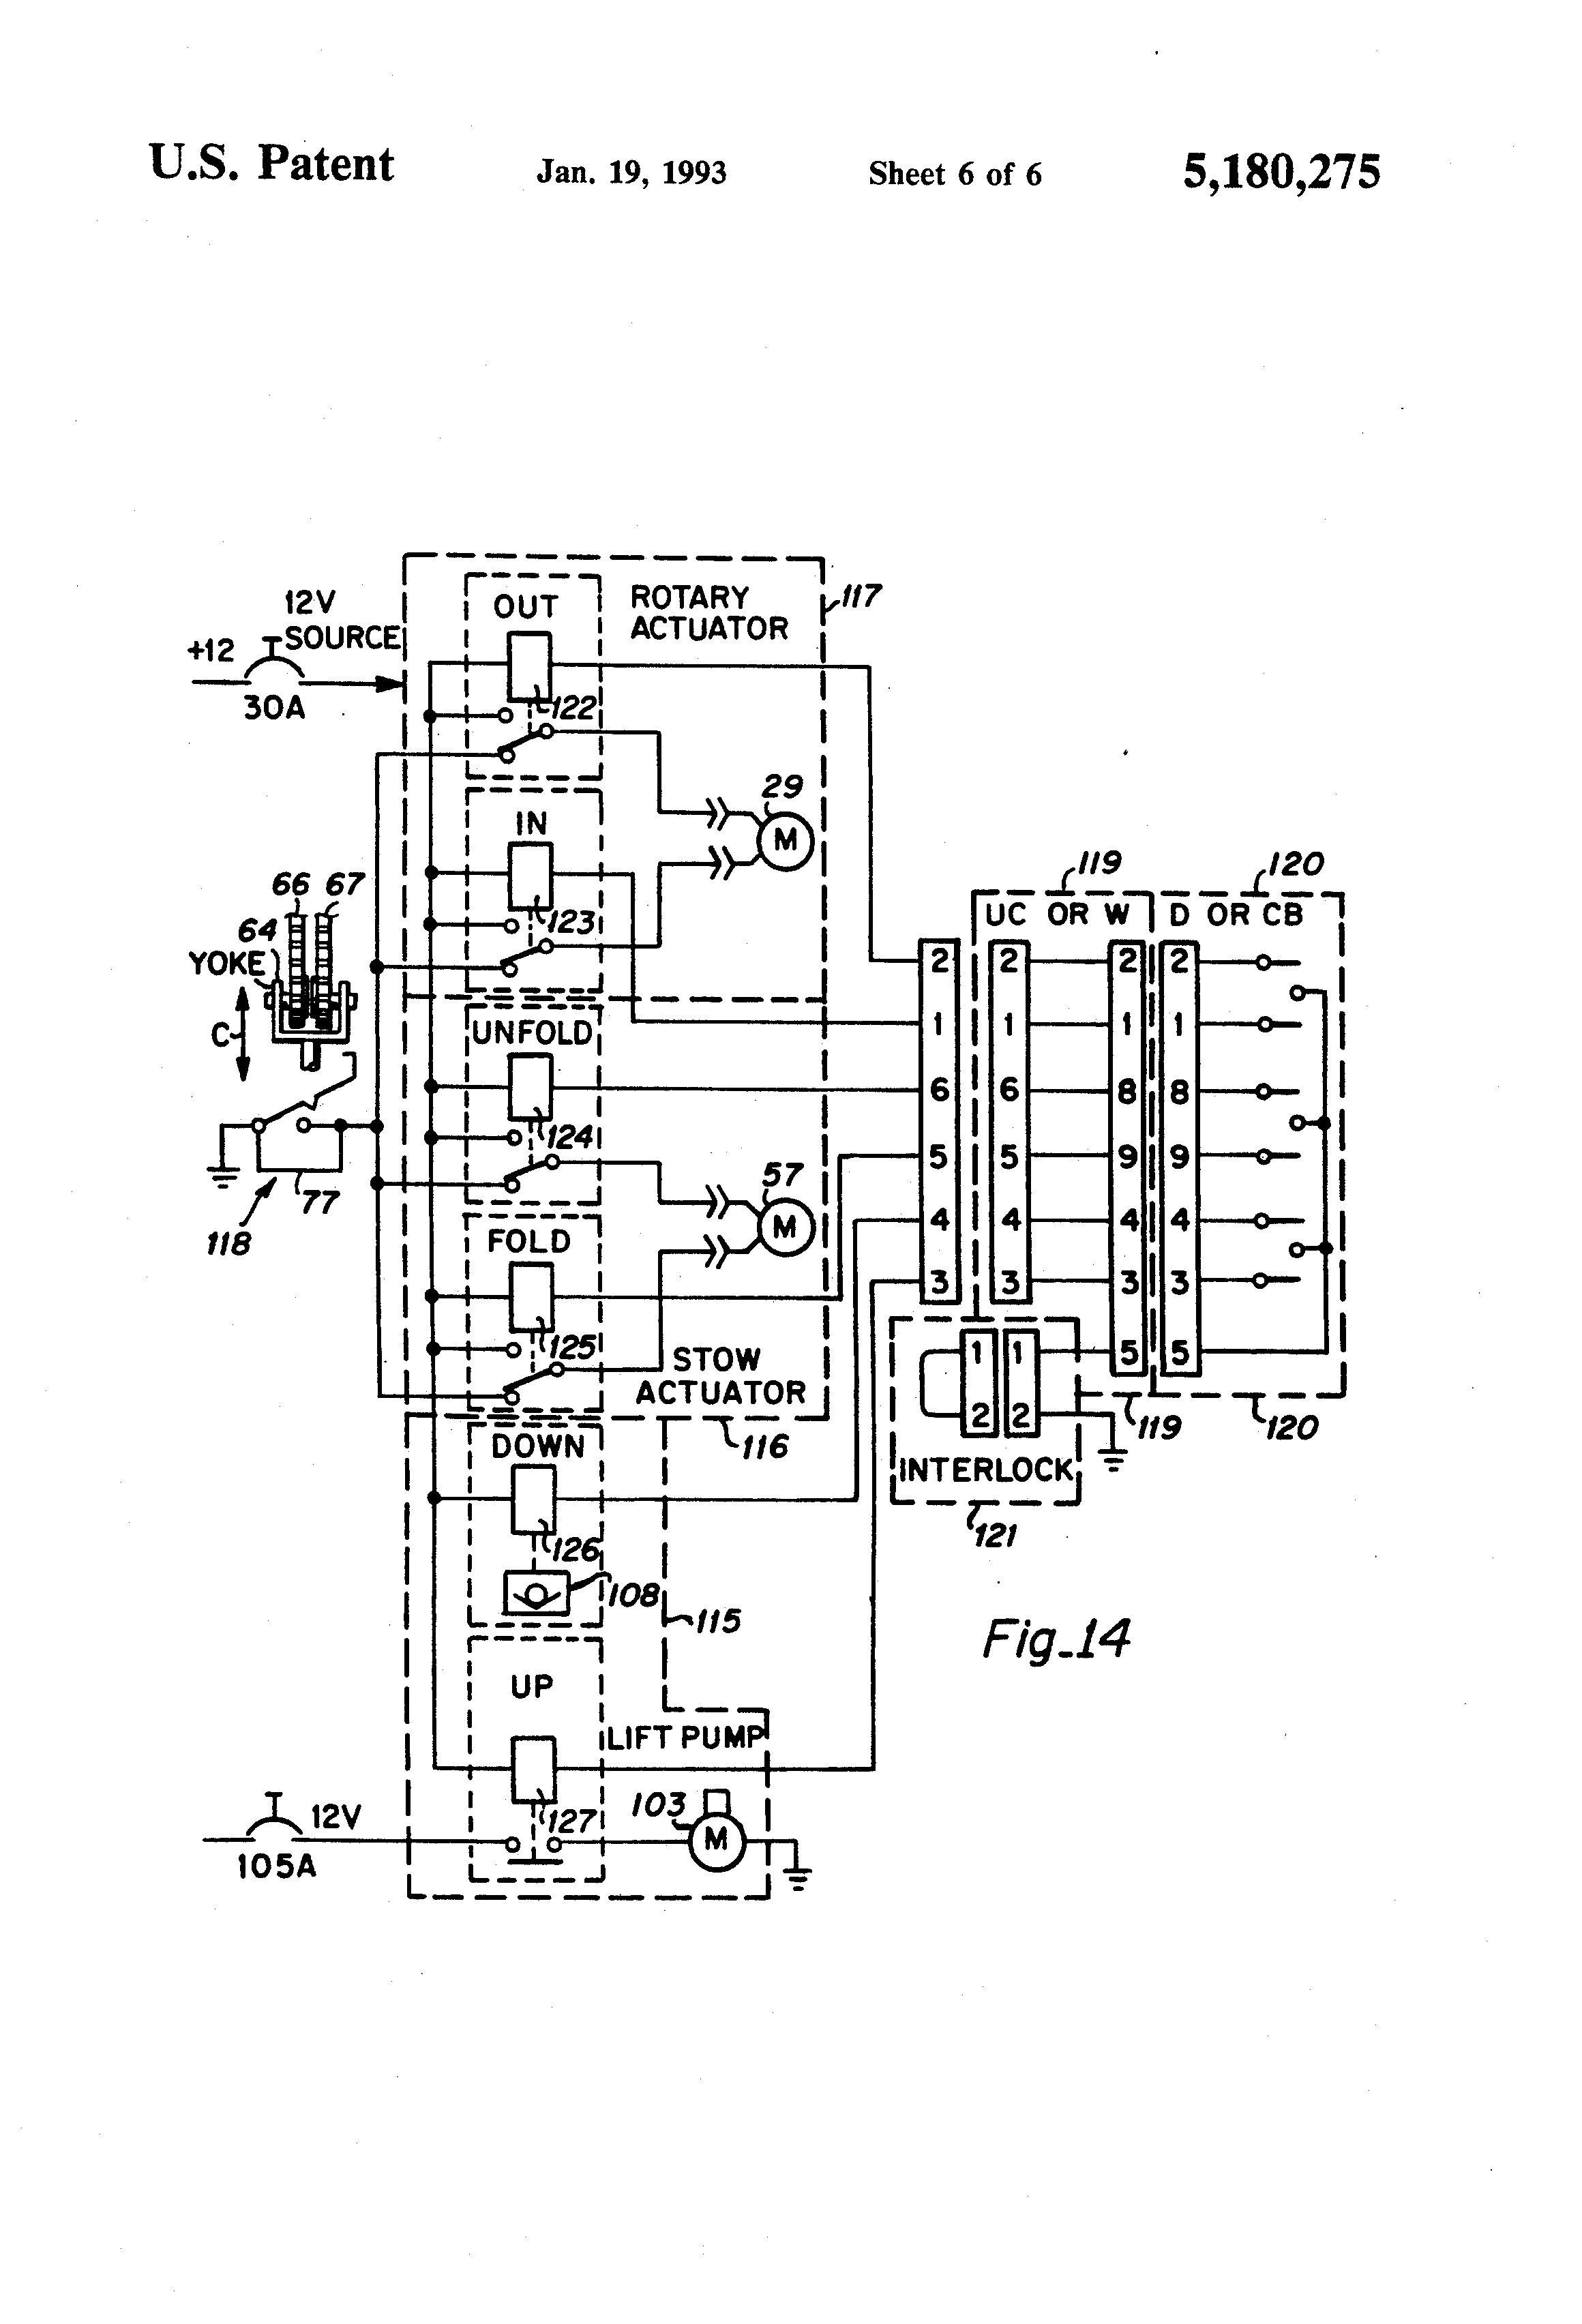 [DIAGRAM] Western Unimount Wiring Harness Diagram FULL